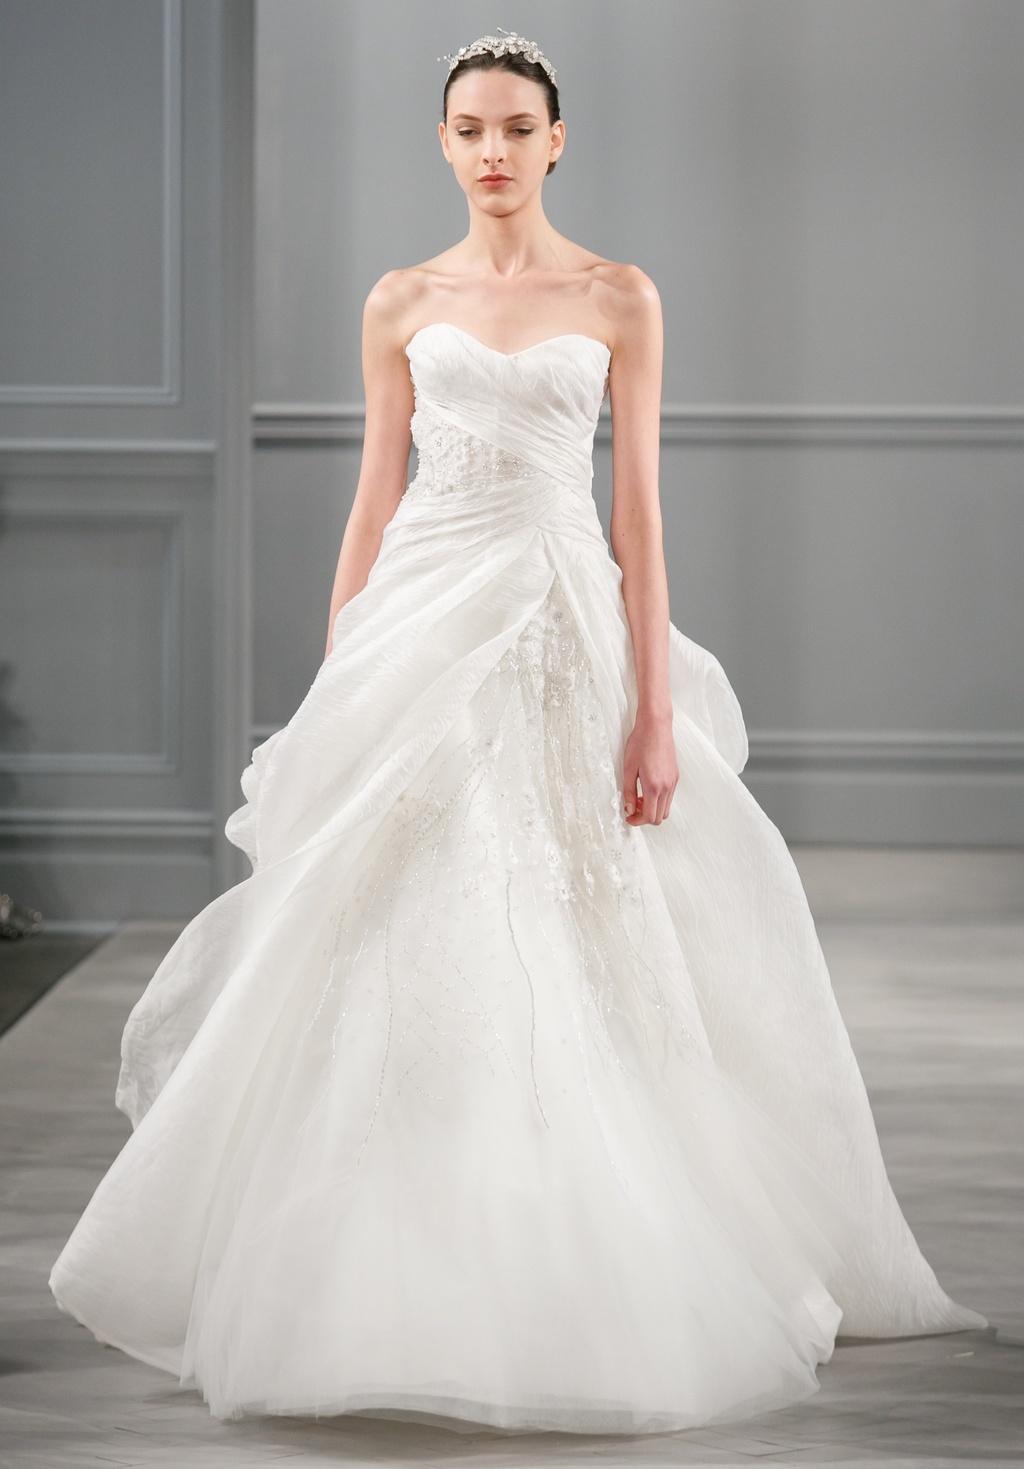 Spring-2014-wedding-dress-monique-lhuillier-bridal-charade.full